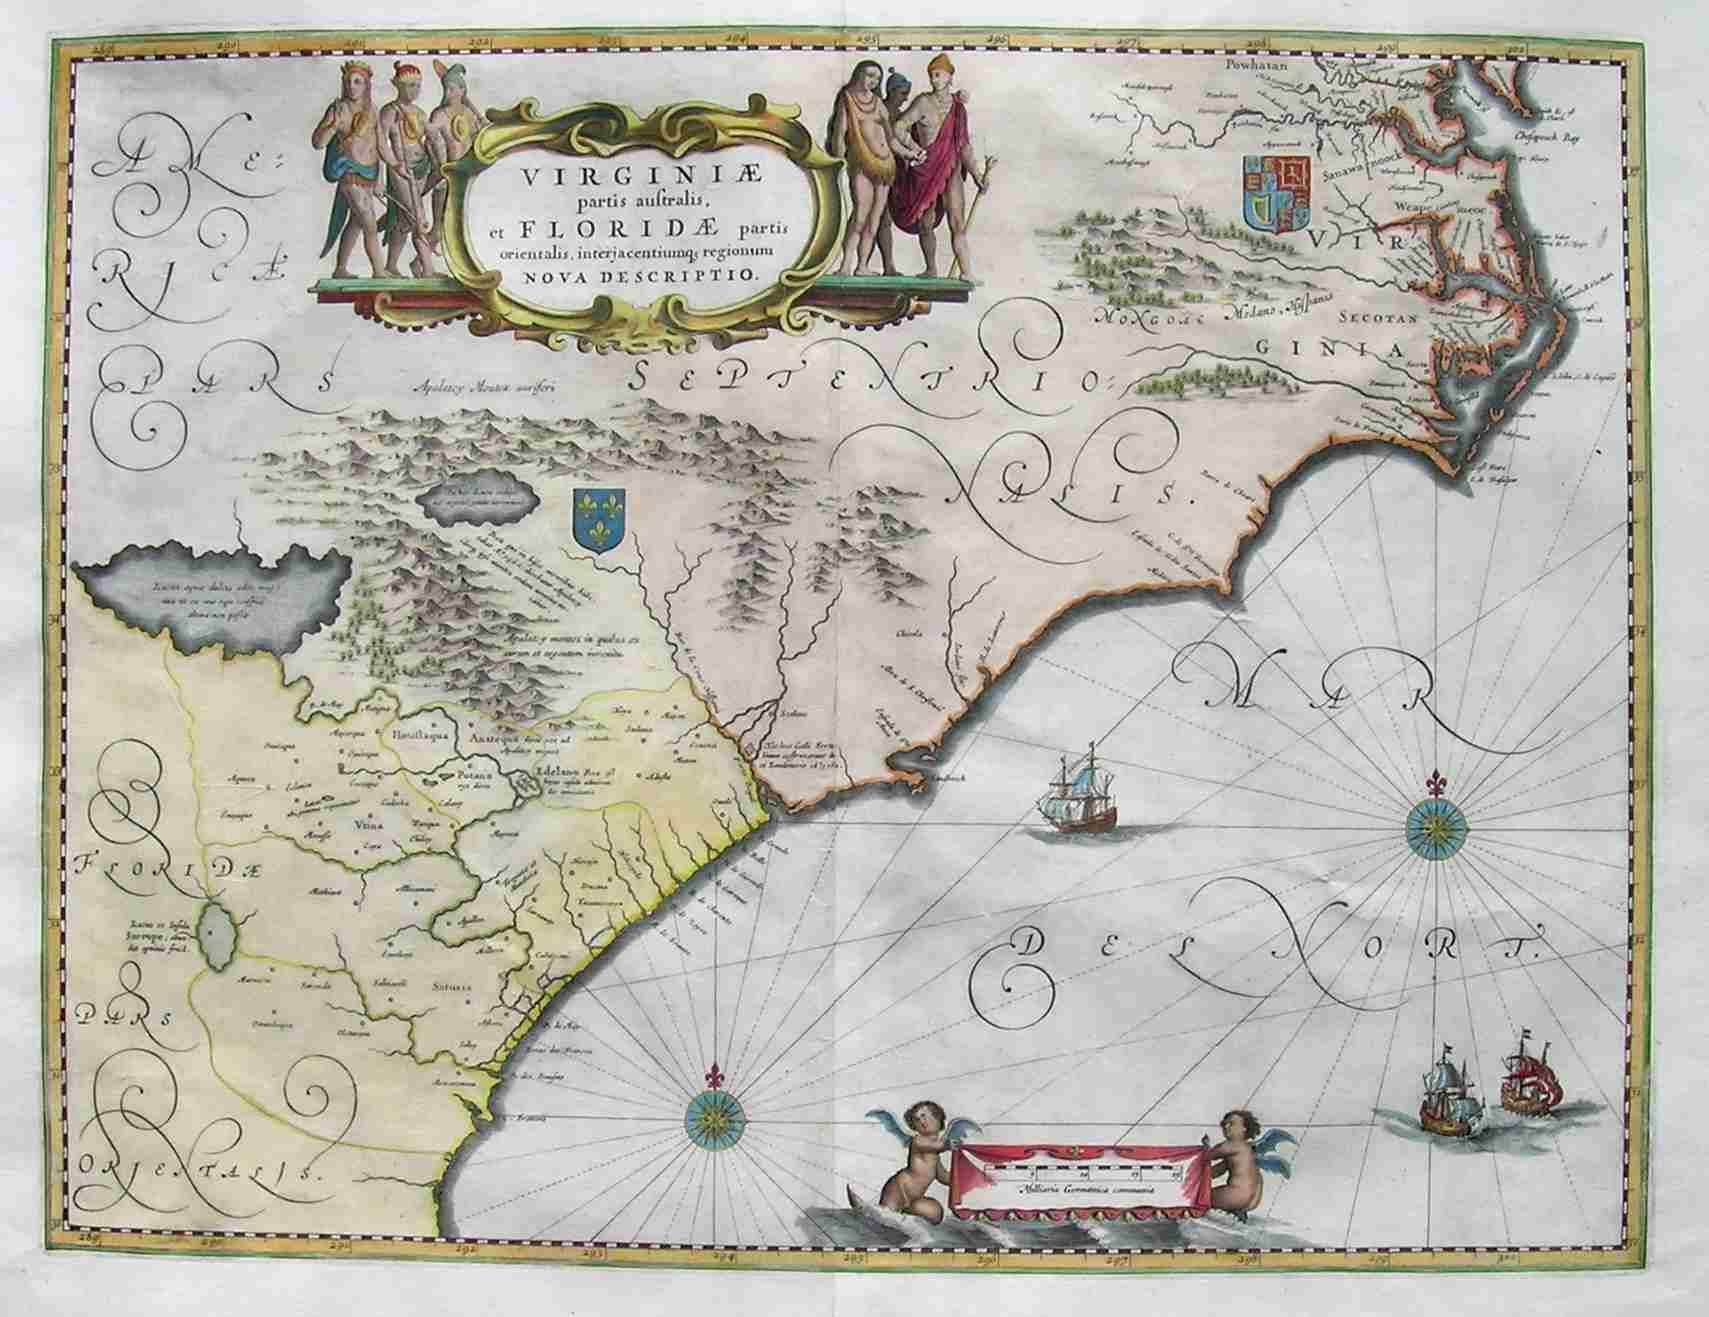 FLORIDACAROLINASVIRGINIA Maphouse Antique Maps Michael - Antique maps amsterdam